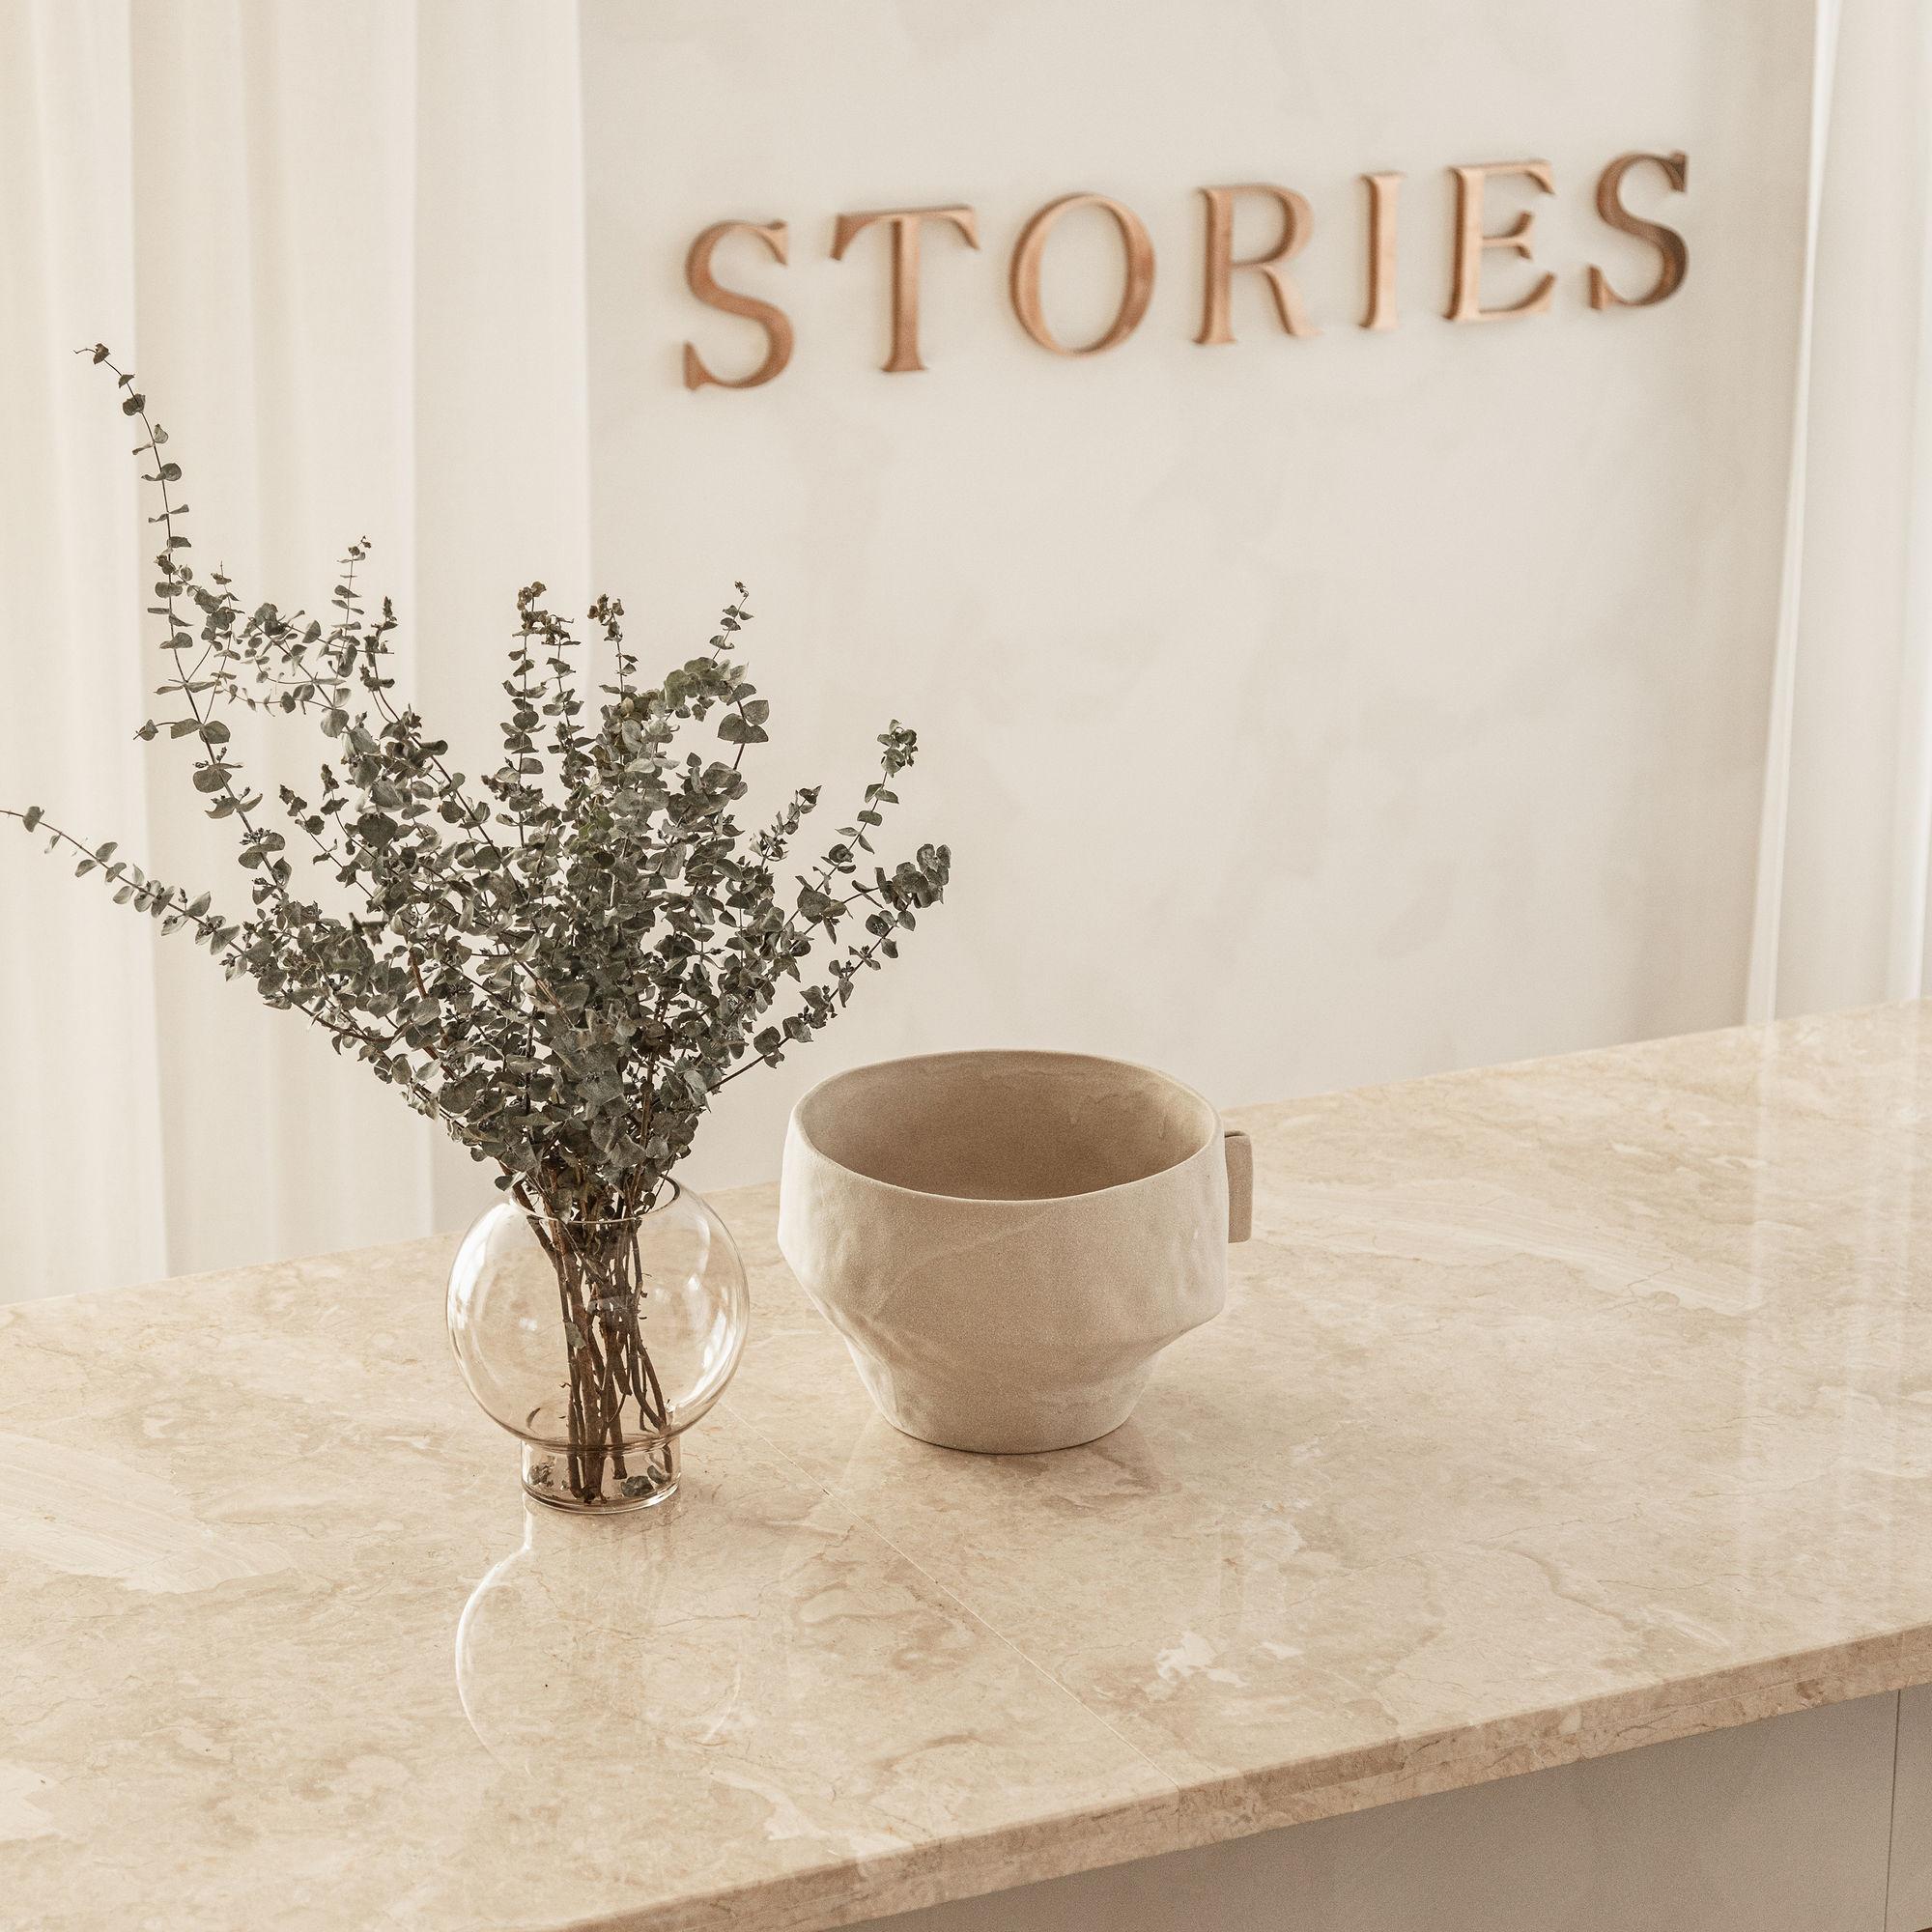 - Stories -